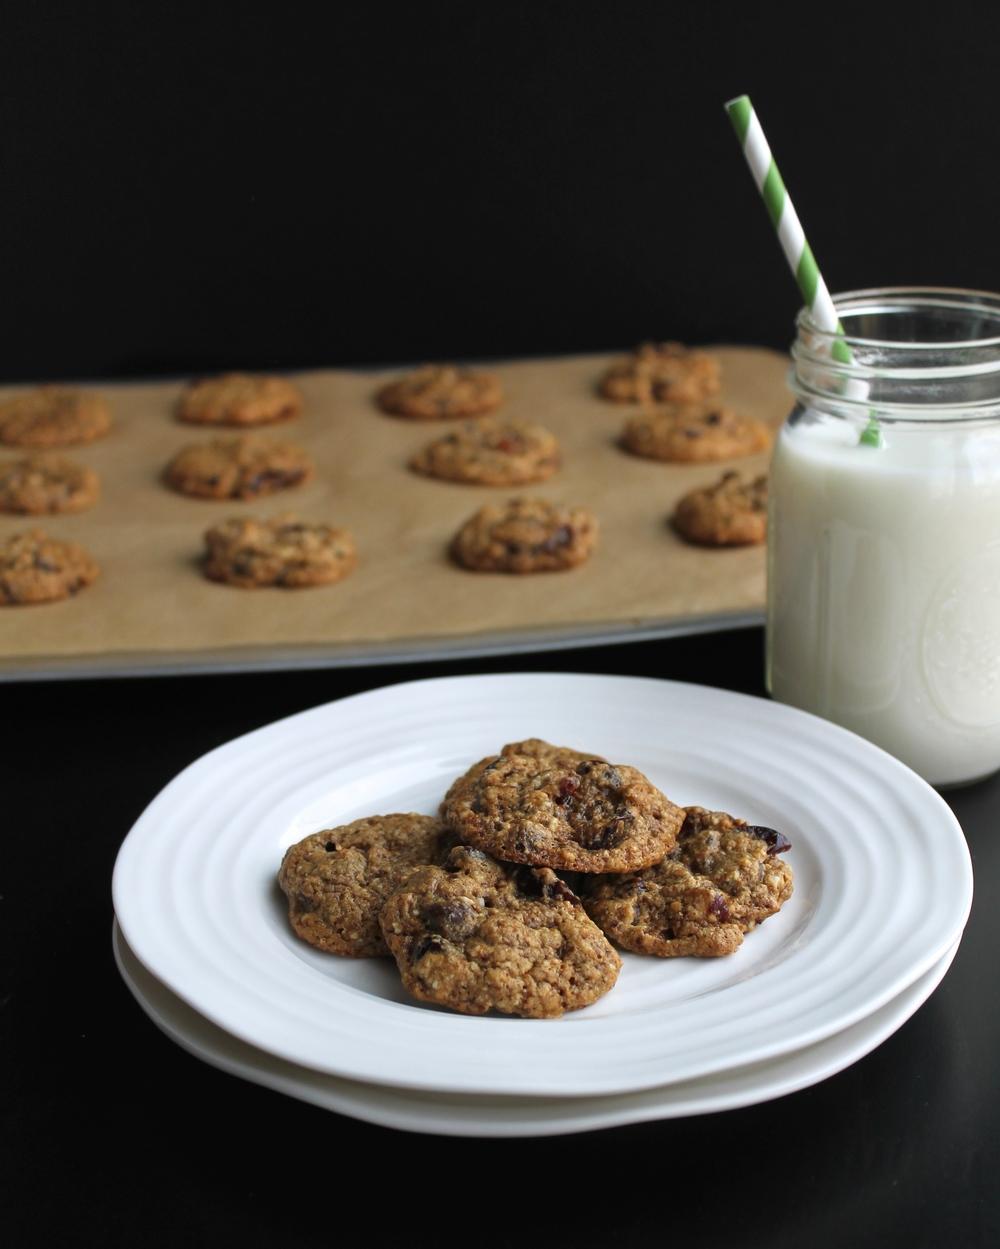 Gluten-Free-Cranberry-Almond-Chocolate-Chip-Cookies.JPG